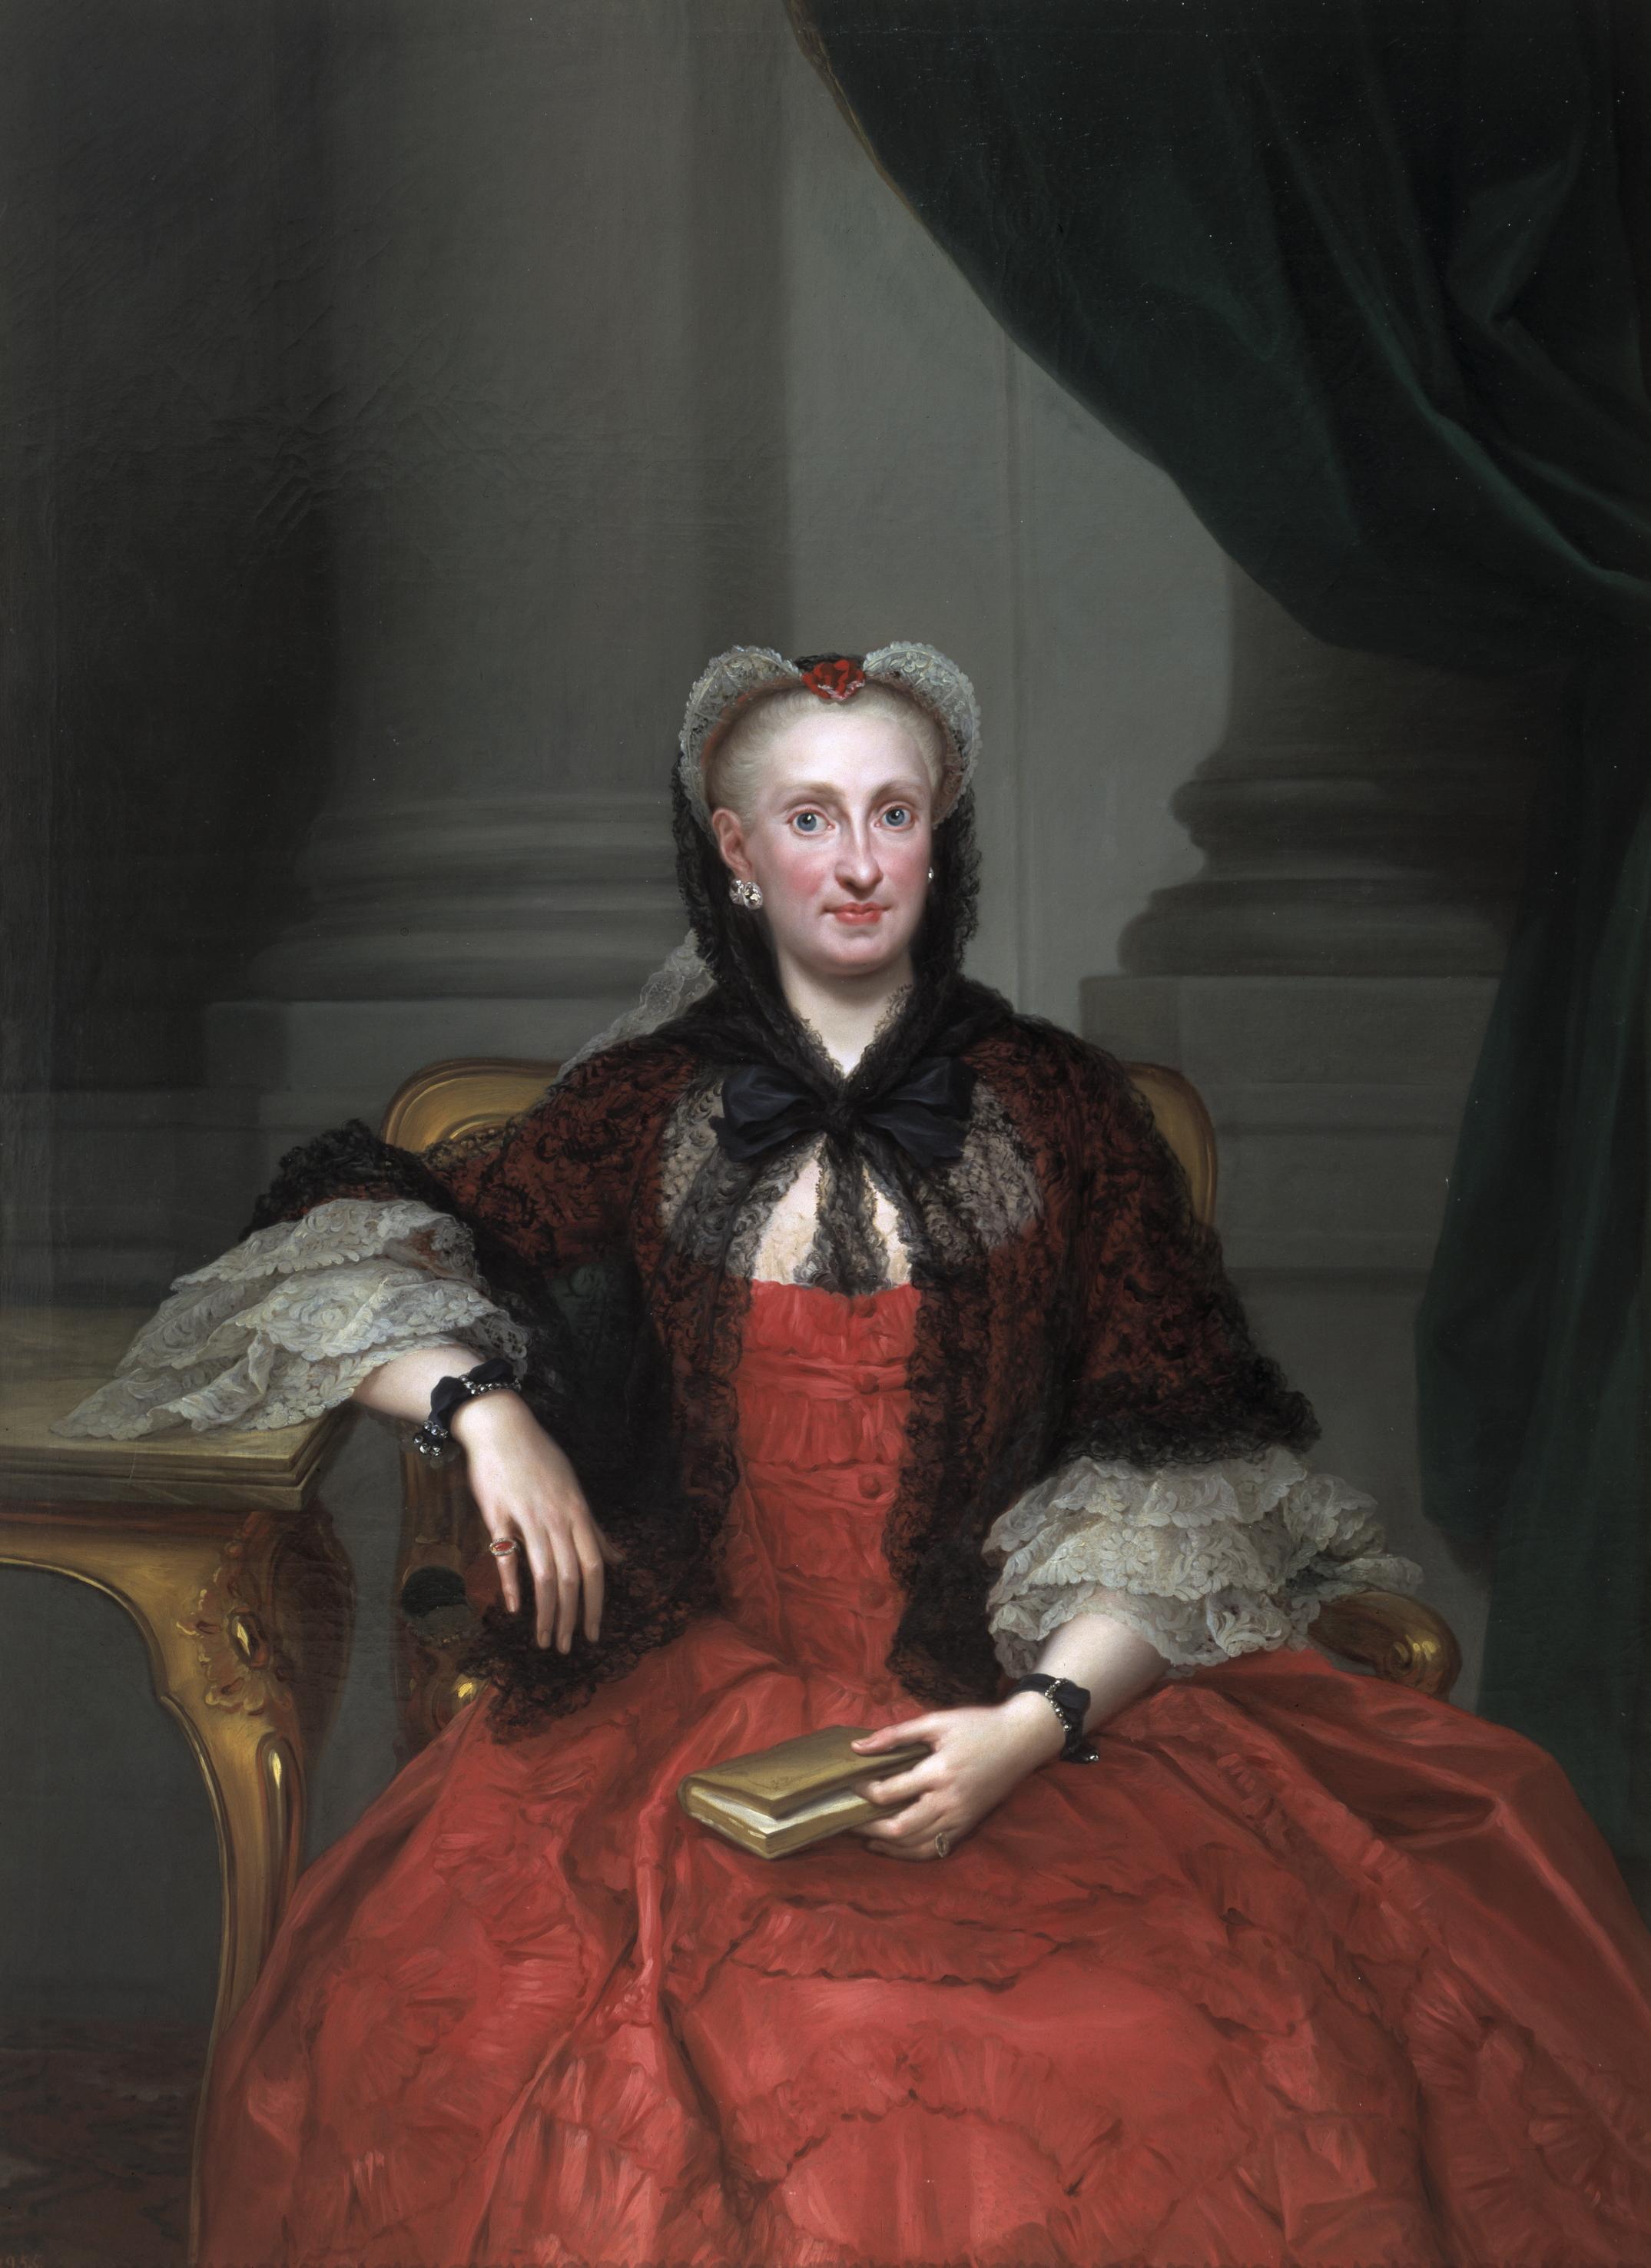 María Amalia de Sajonia, reina consorte de Nápoles y Sicilia;  Reina consorte de Spain.jpg